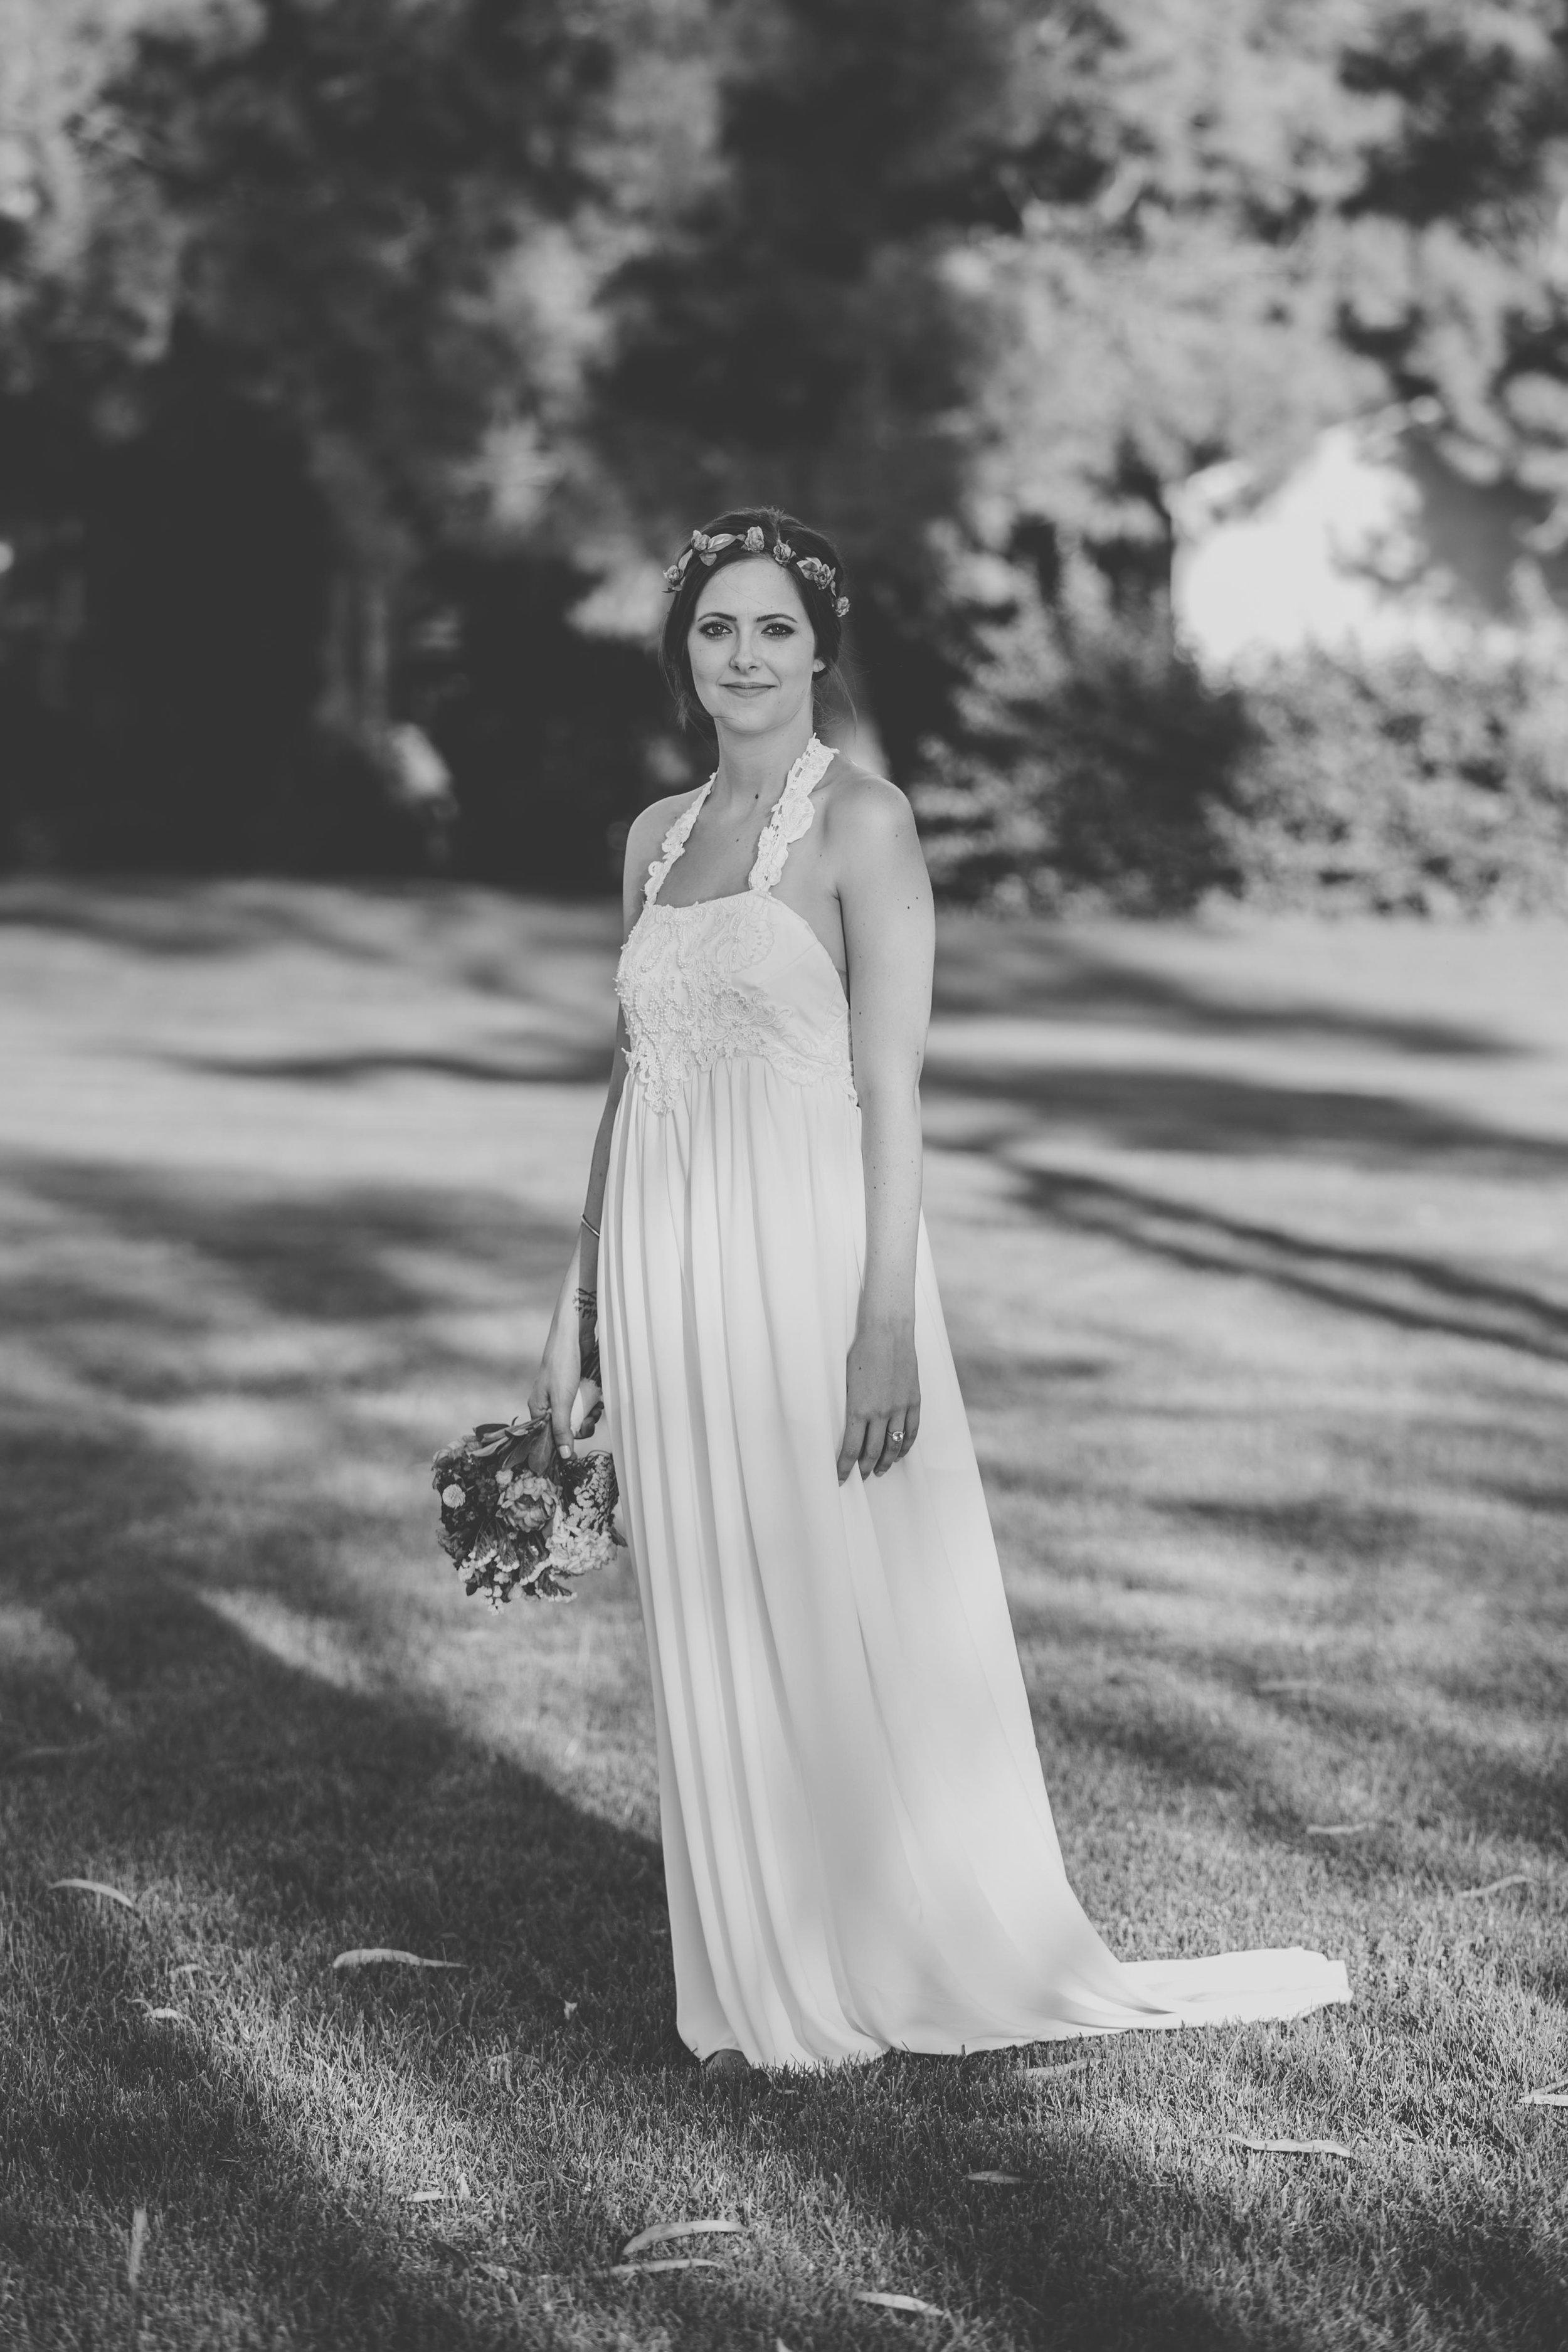 20141024-DePartee-Wedding-APavone-042-sm.jpg